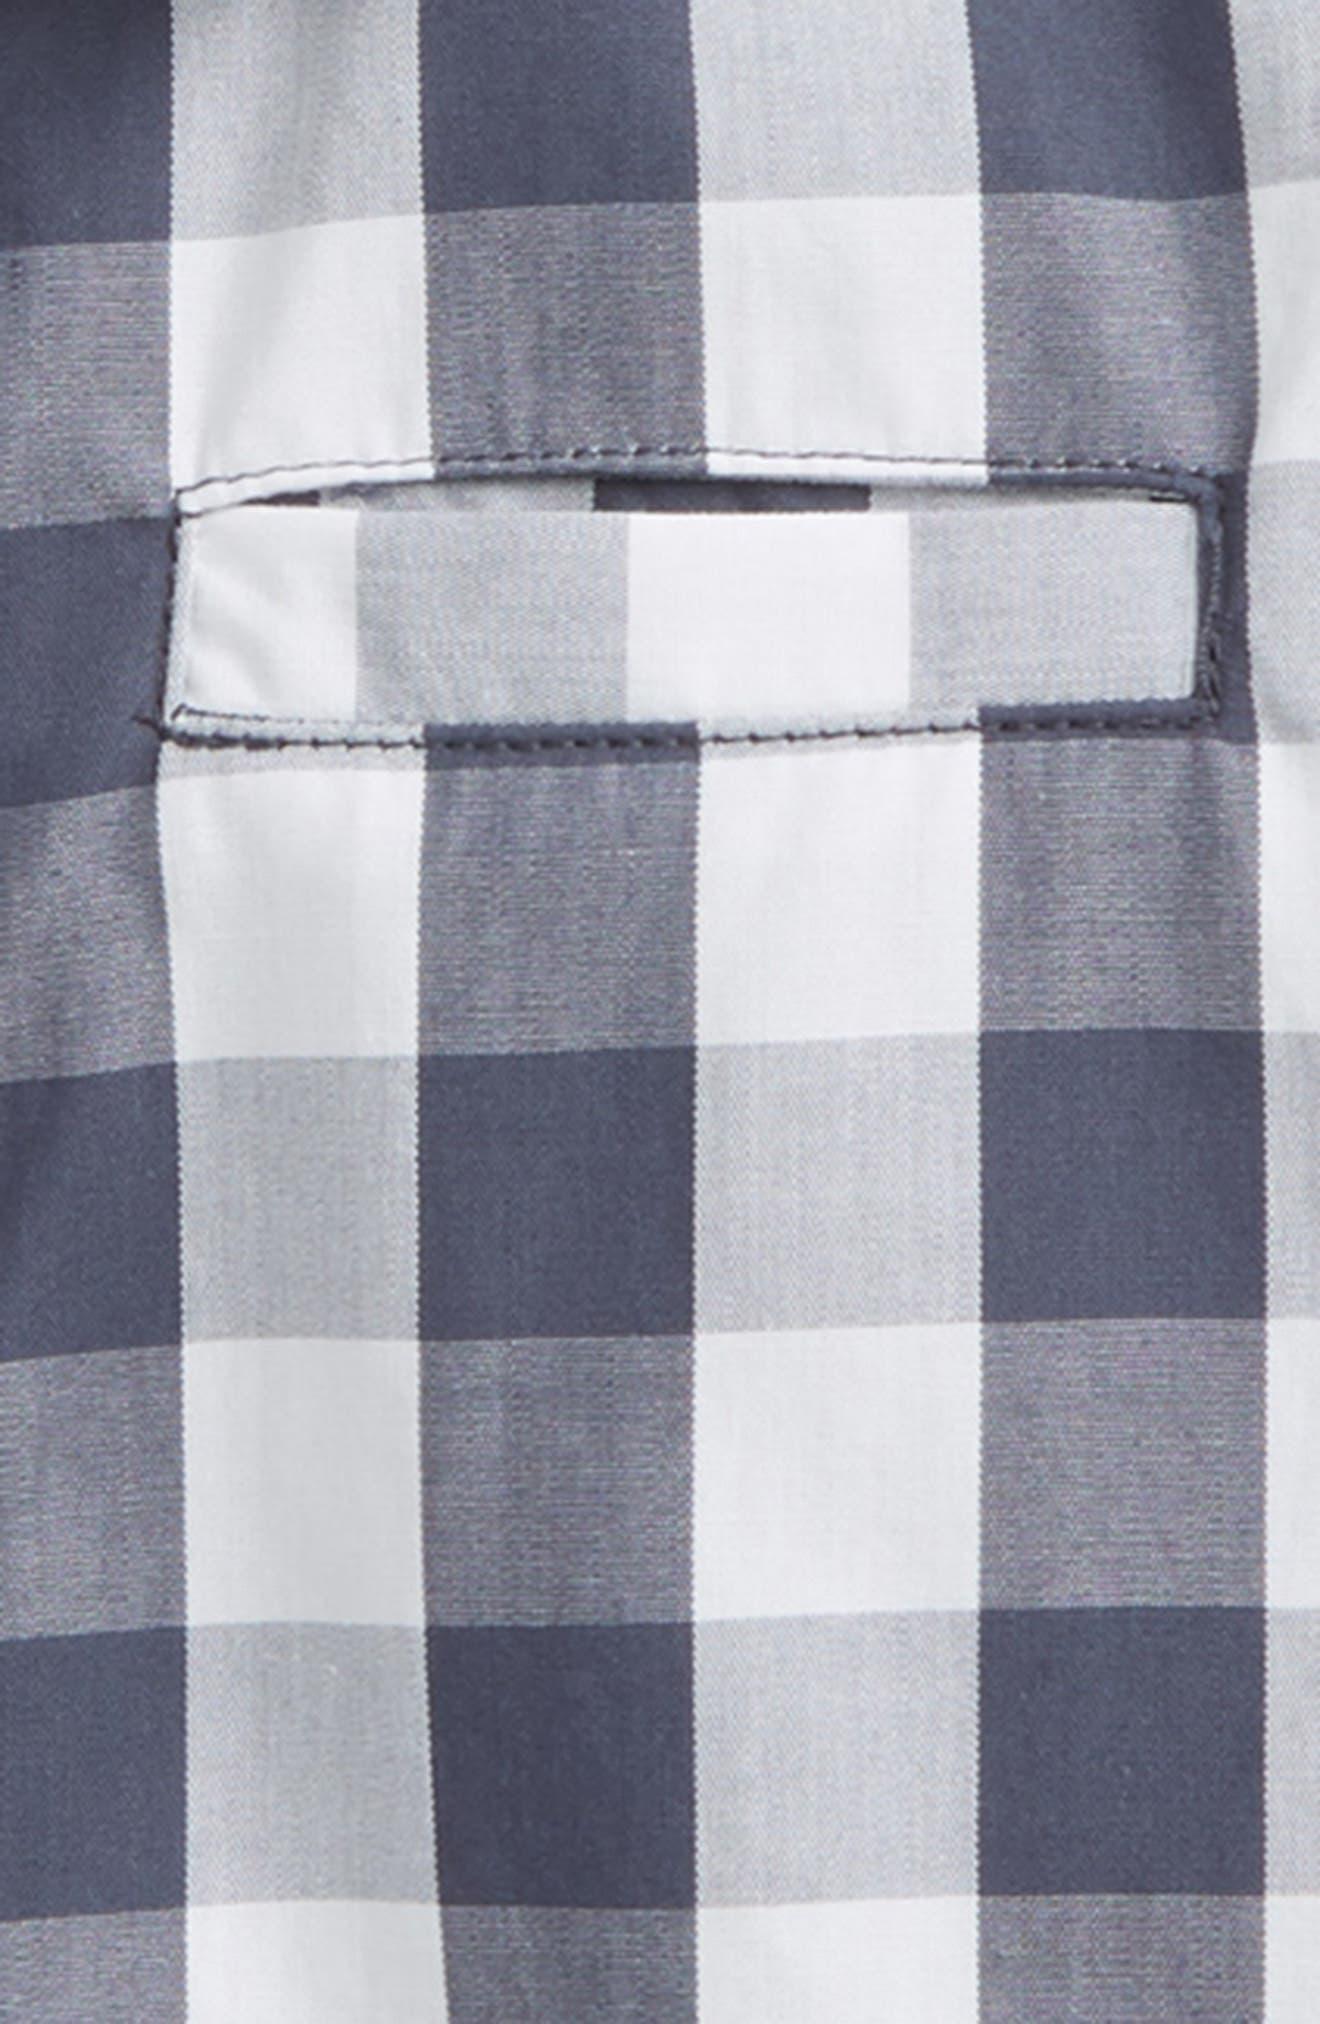 Ellias Check Shirt,                             Alternate thumbnail 2, color,                             Greyblue